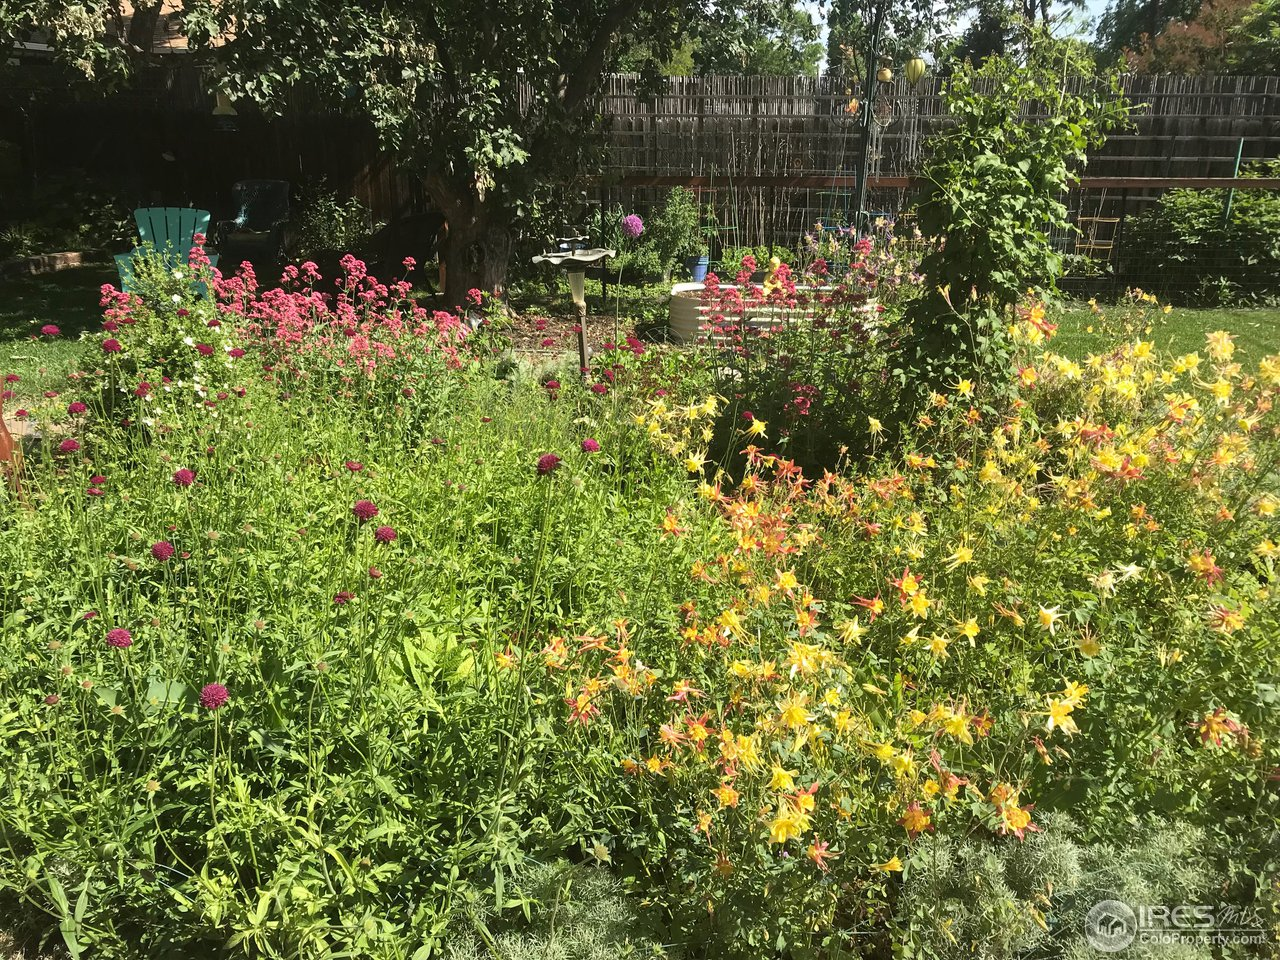 Mature Landscaping & Gardens